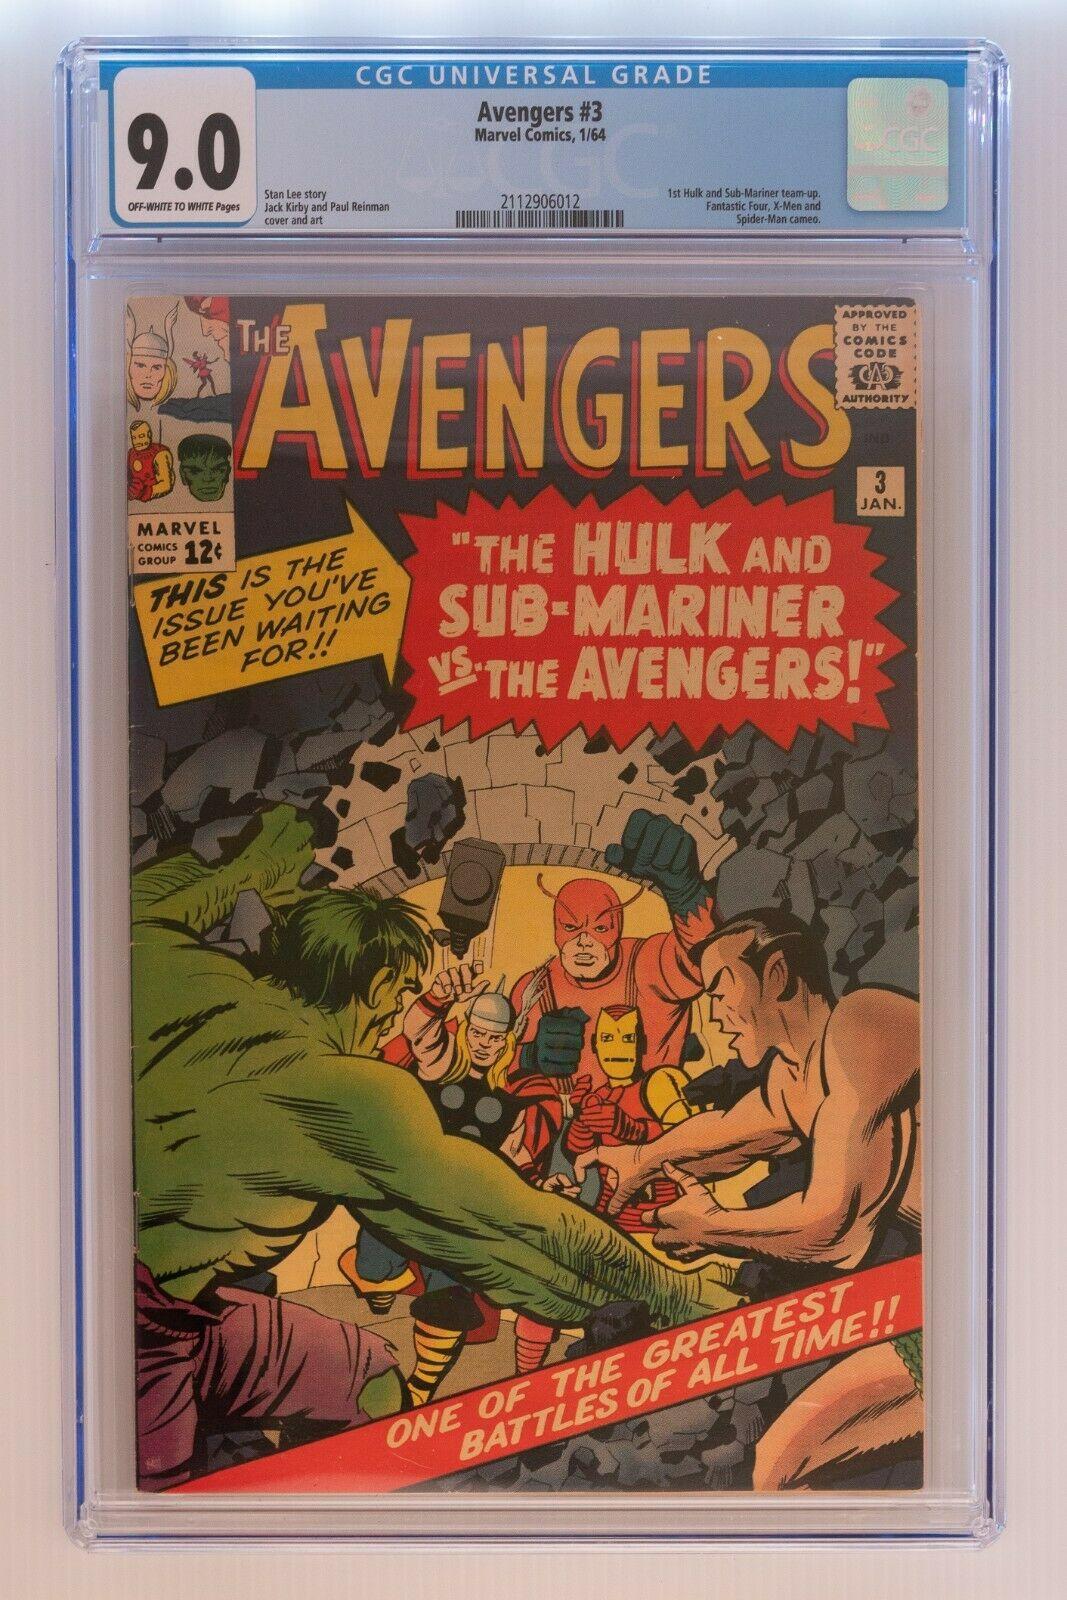 Avengers Issue 3  90 CGC Grade